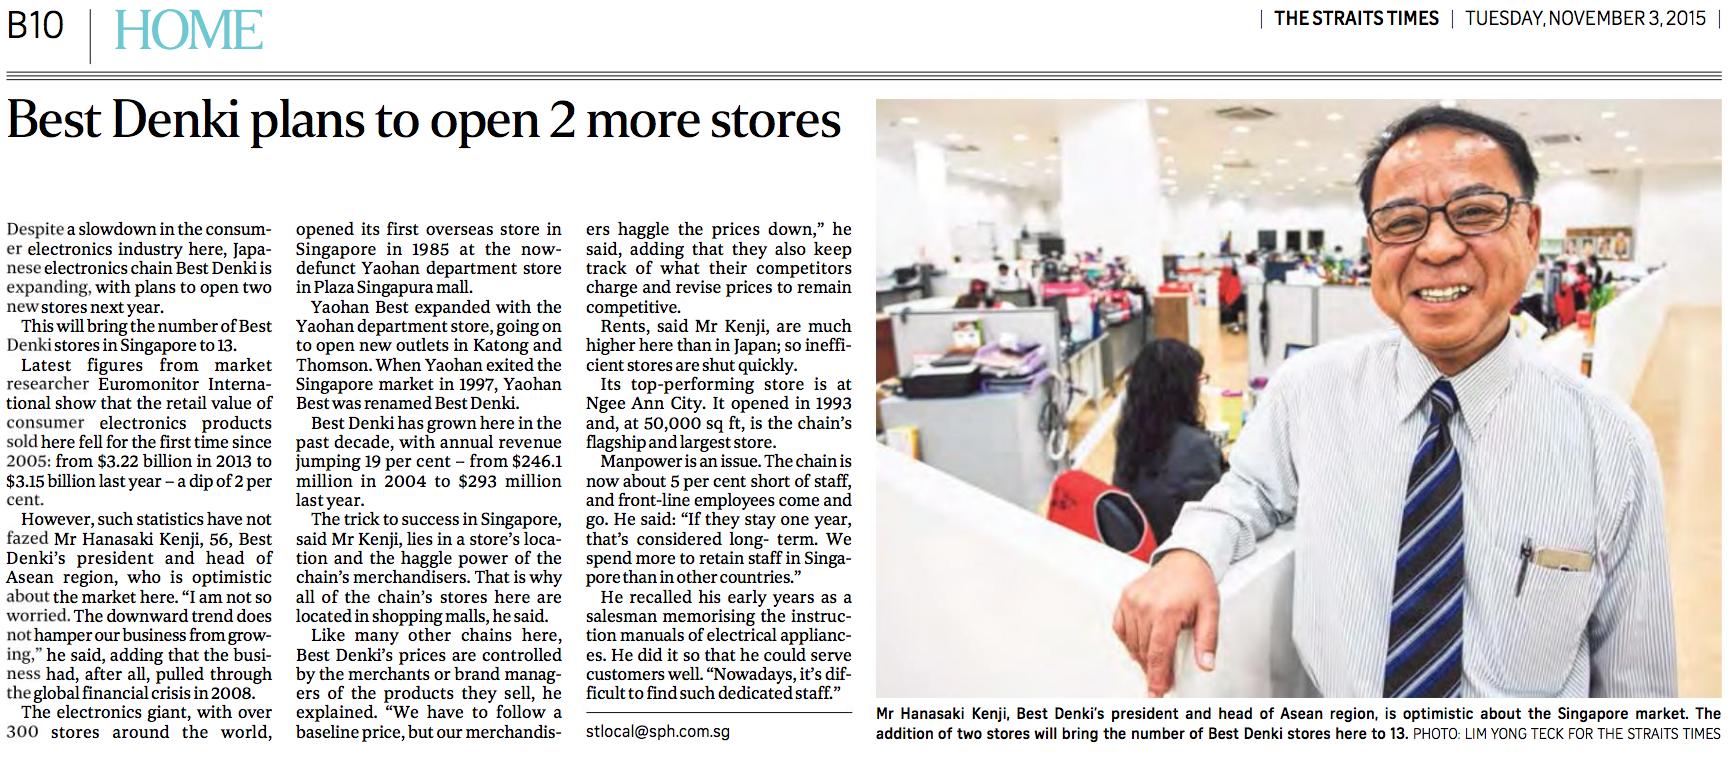 Kenji Hanasaki feature for The Straits Times (www.straitstimes.com)